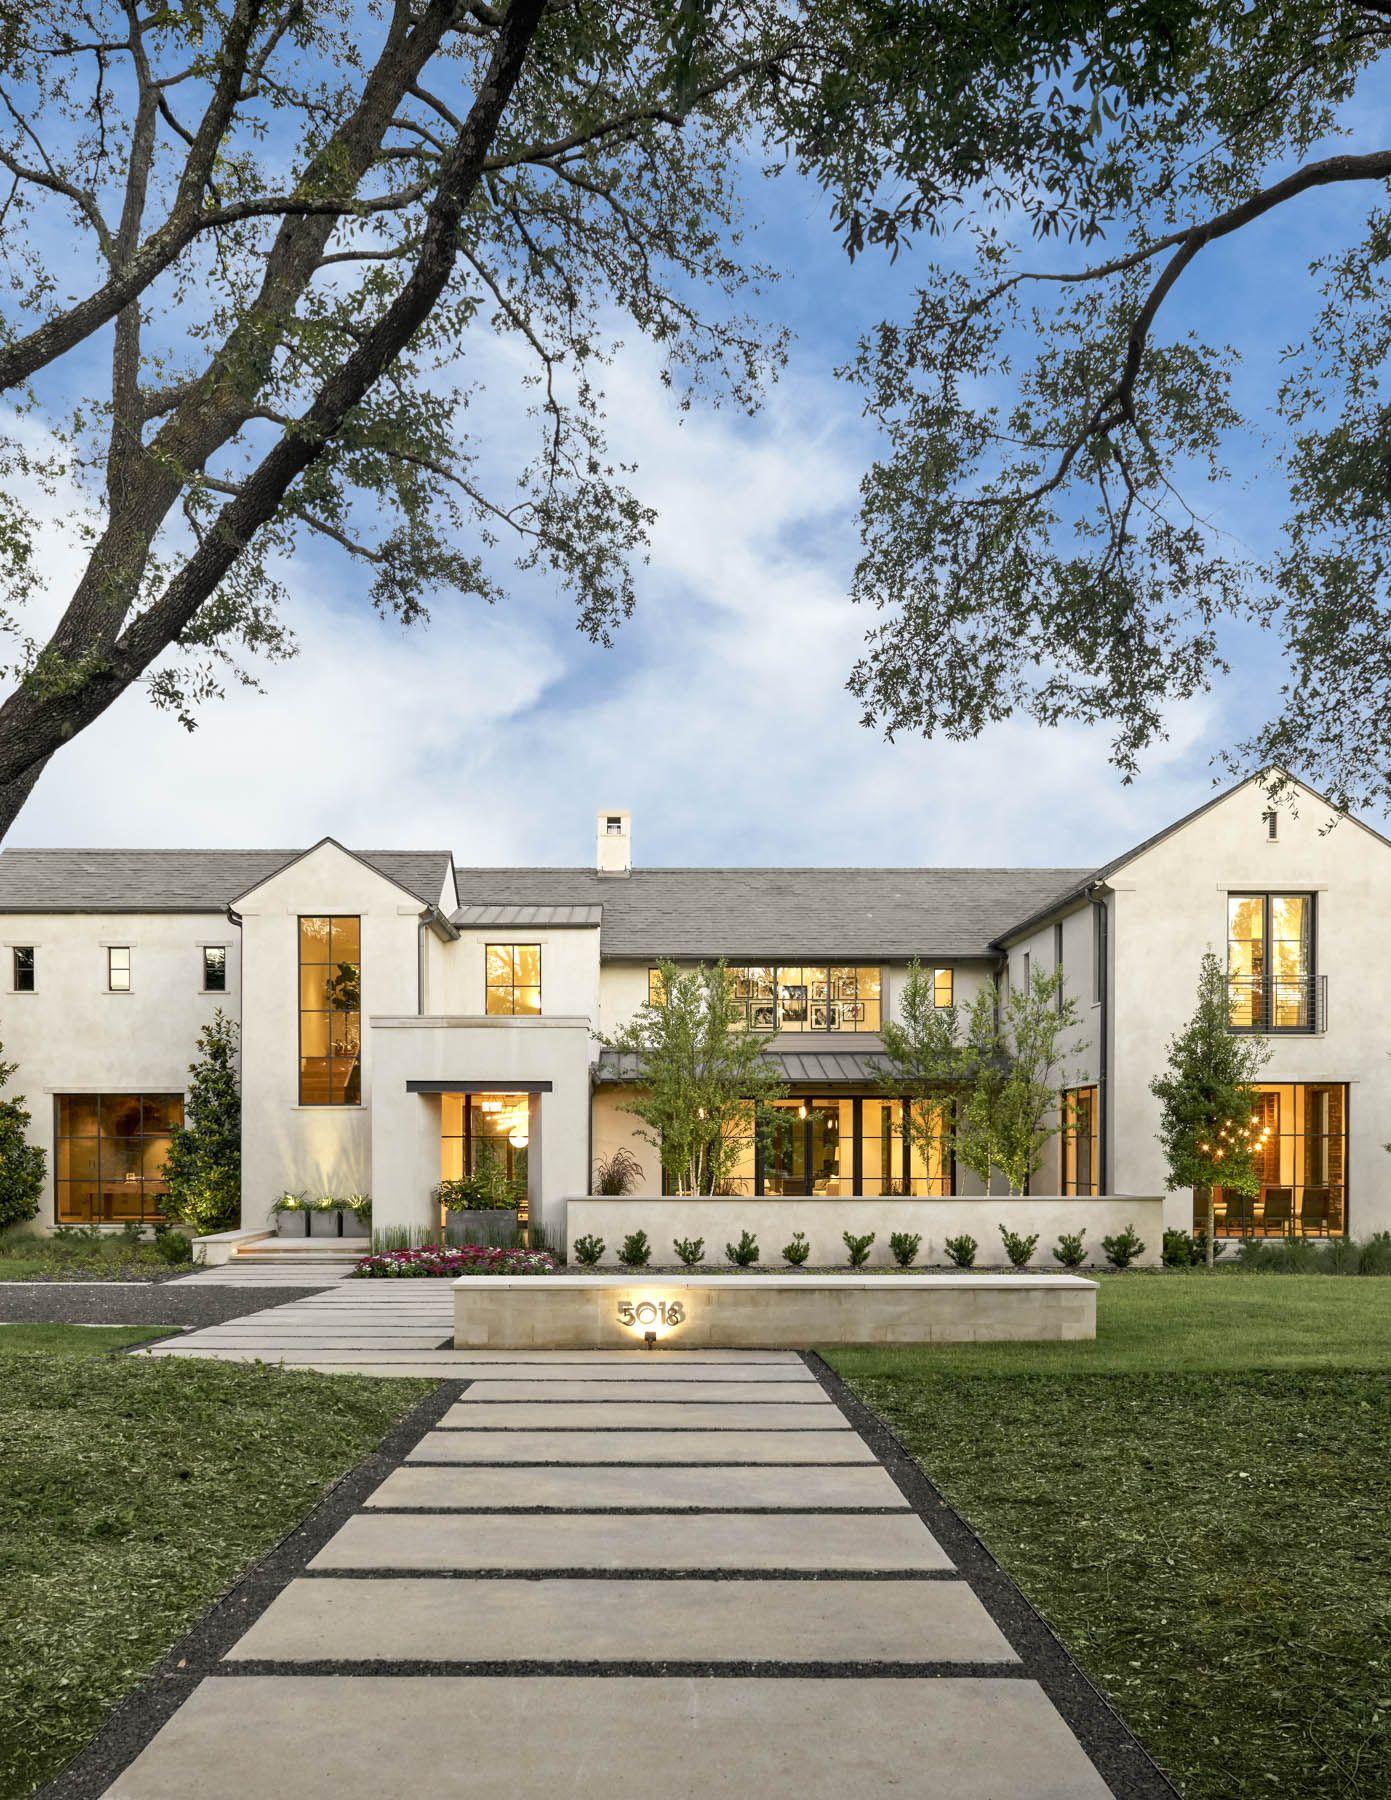 5018radbrookpl 0493 Jpg House Designs Exterior Modern Farmhouse Exterior Dream House Exterior